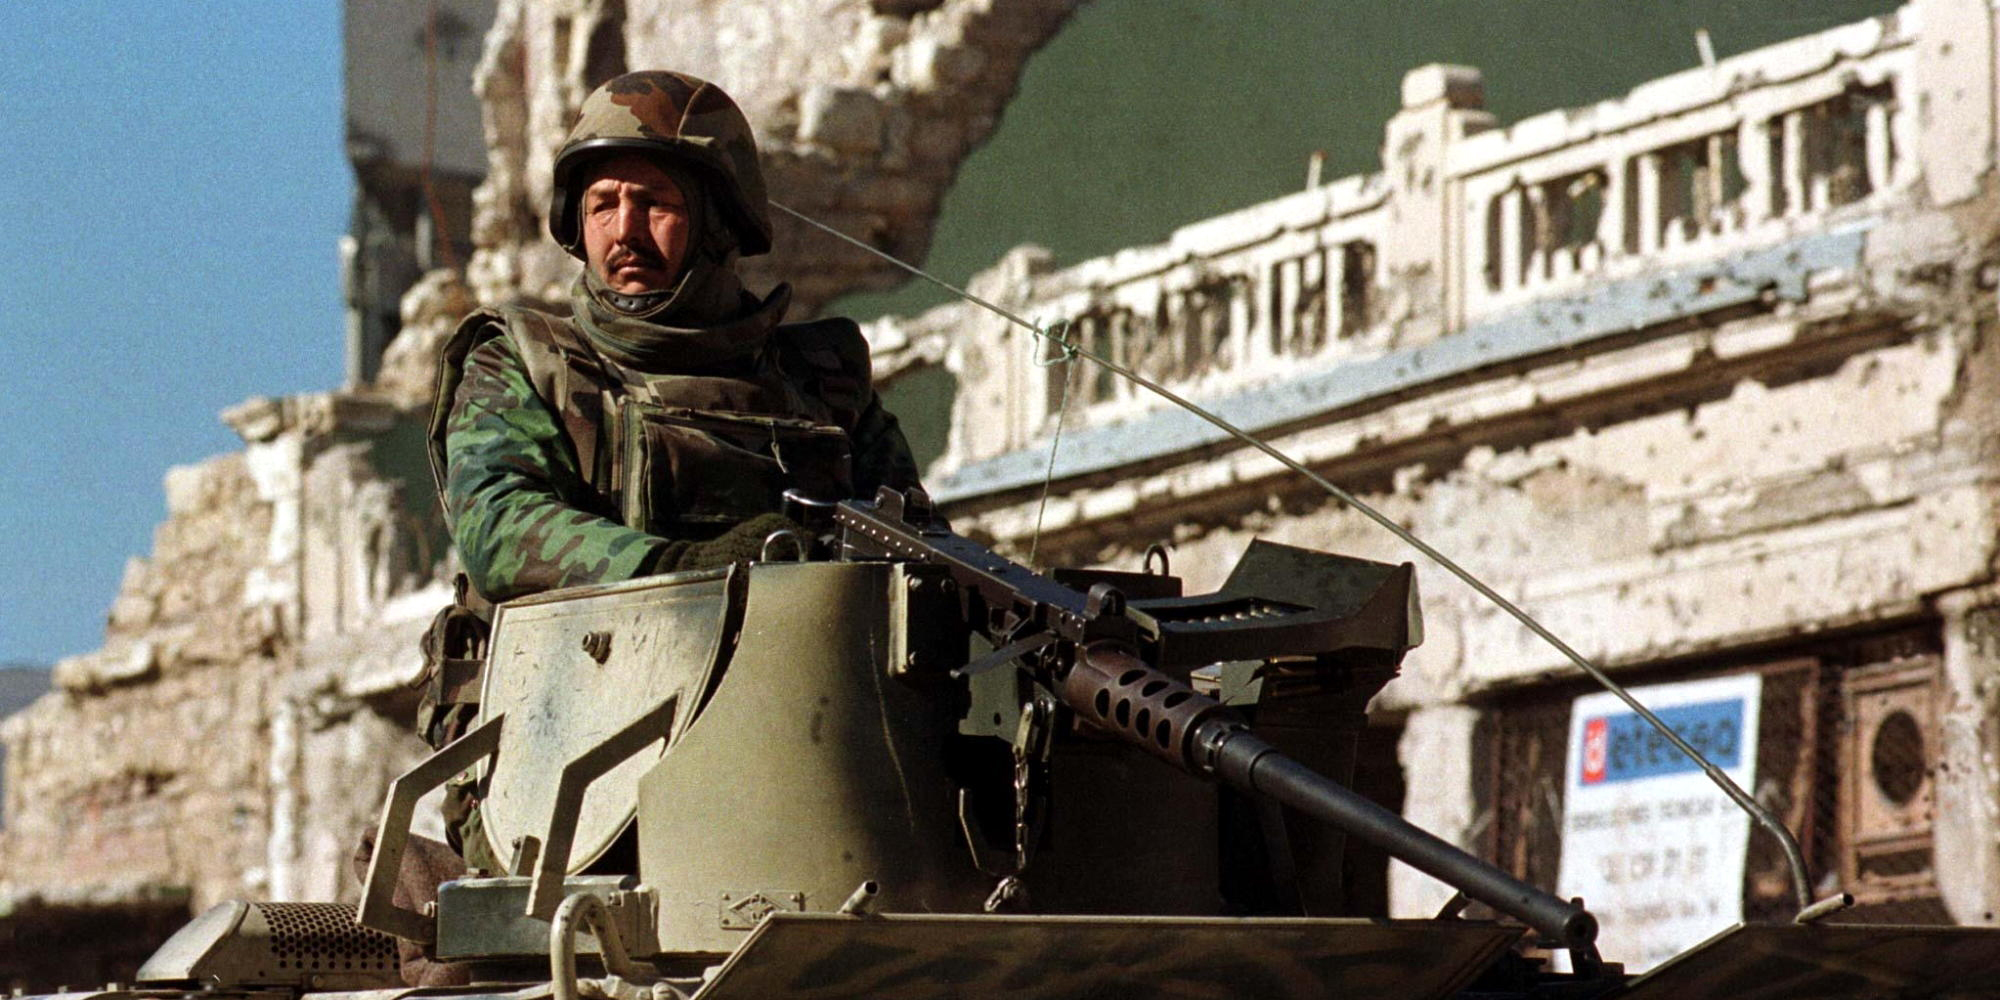 Les F.A.R. en Bosnie  IFOR, SFOR et EUFOR Althea 34525686532_32952e3443_o